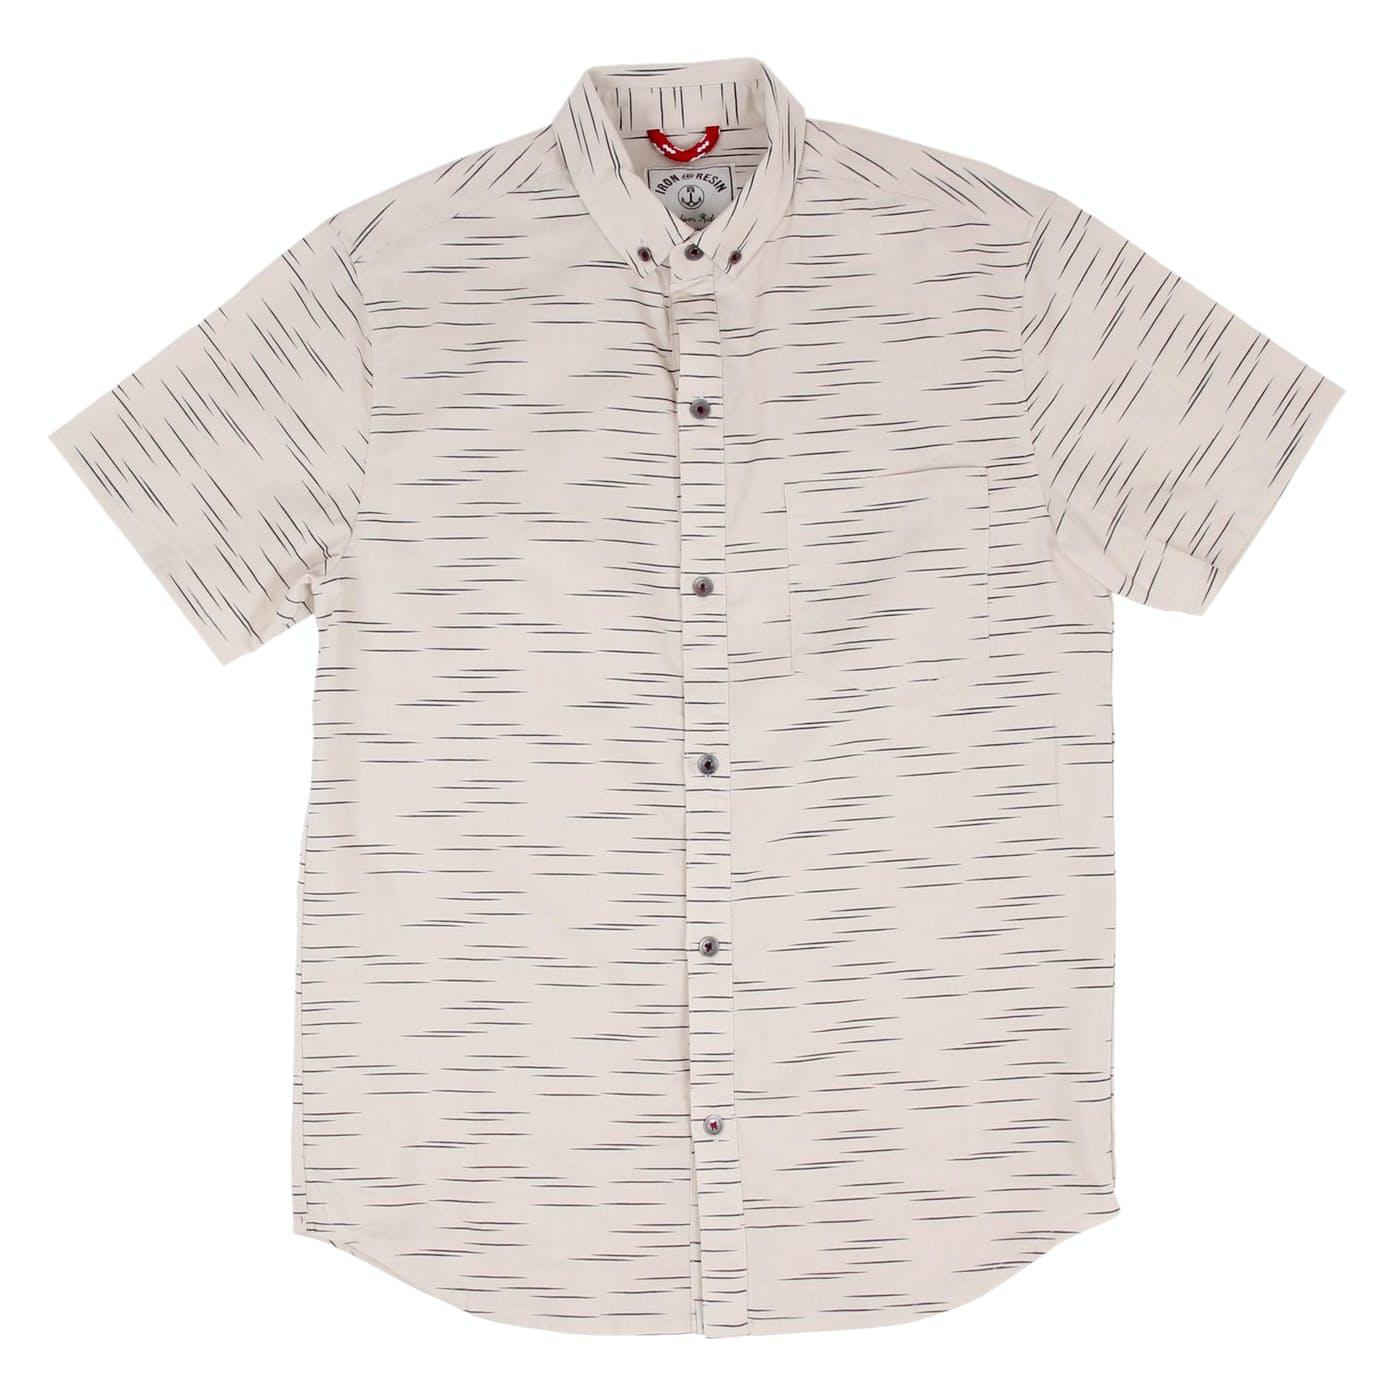 1zi05hbubk iron and resin linear shirt 0 original